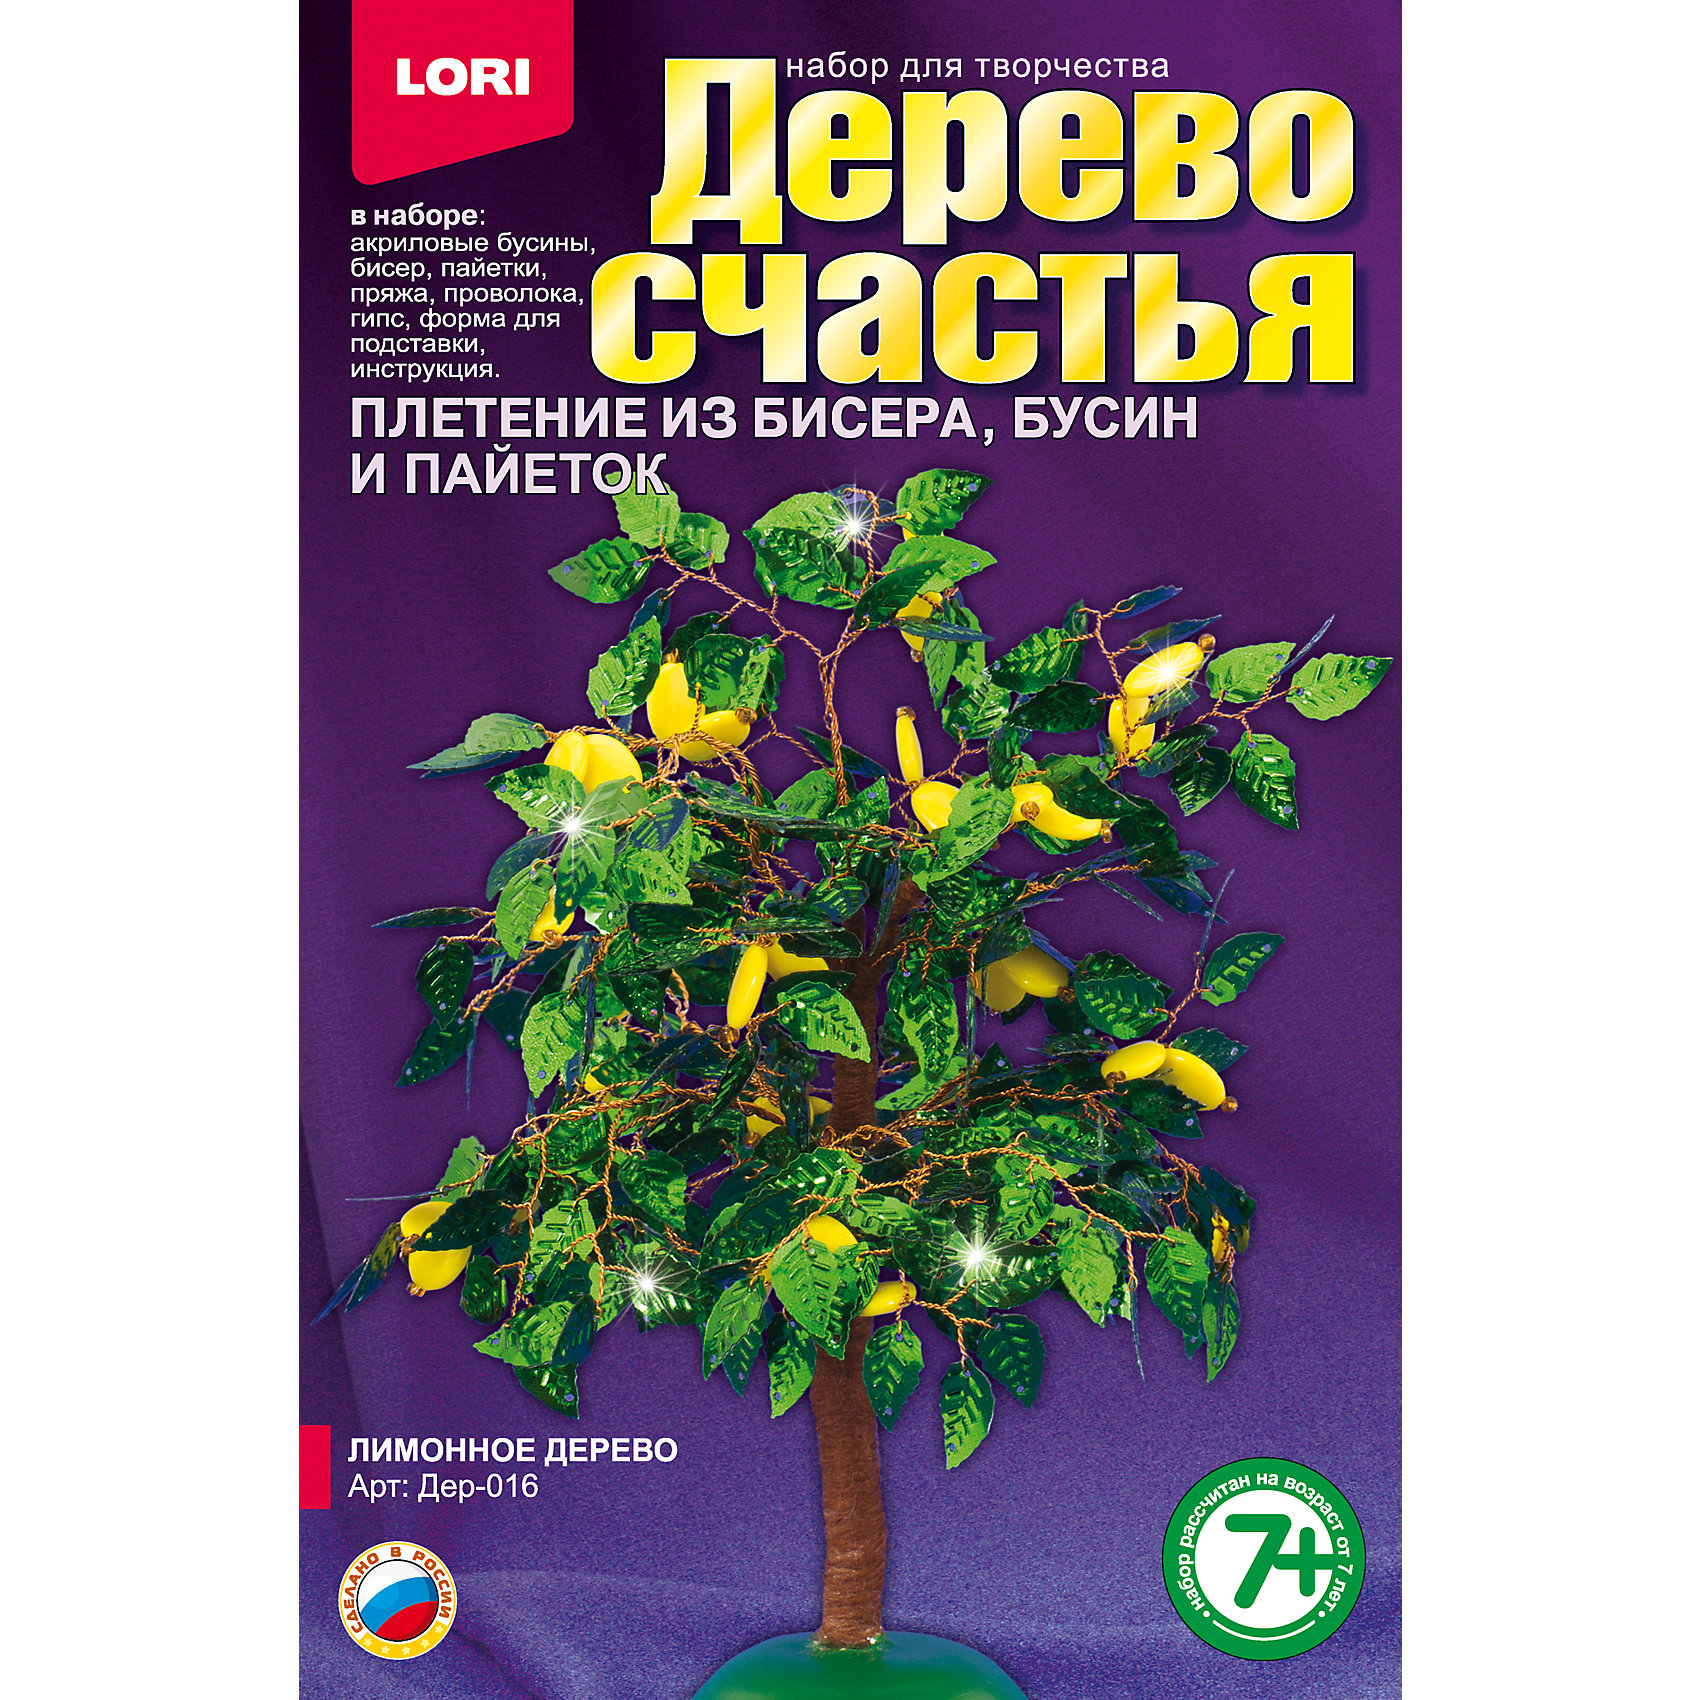 LORI Дерево счастья Лимонное дерево lori фоторамки из гипса фрукты